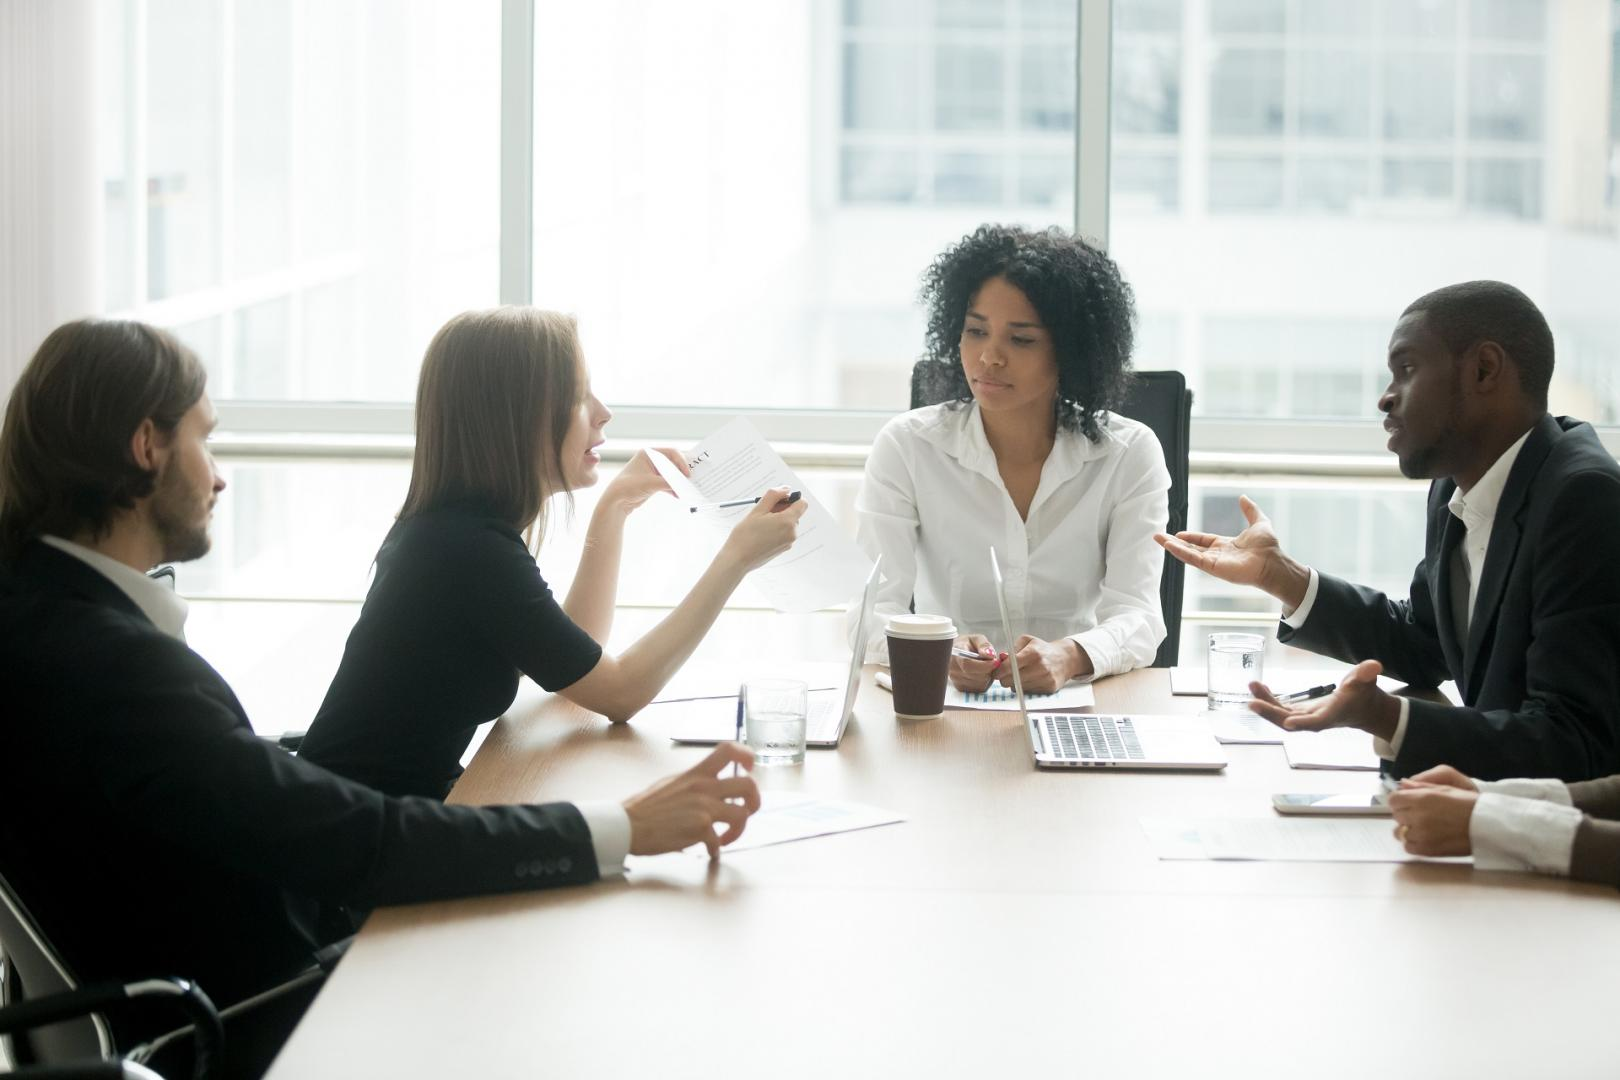 Lösungsstrategien bei der Planung einer Gründung